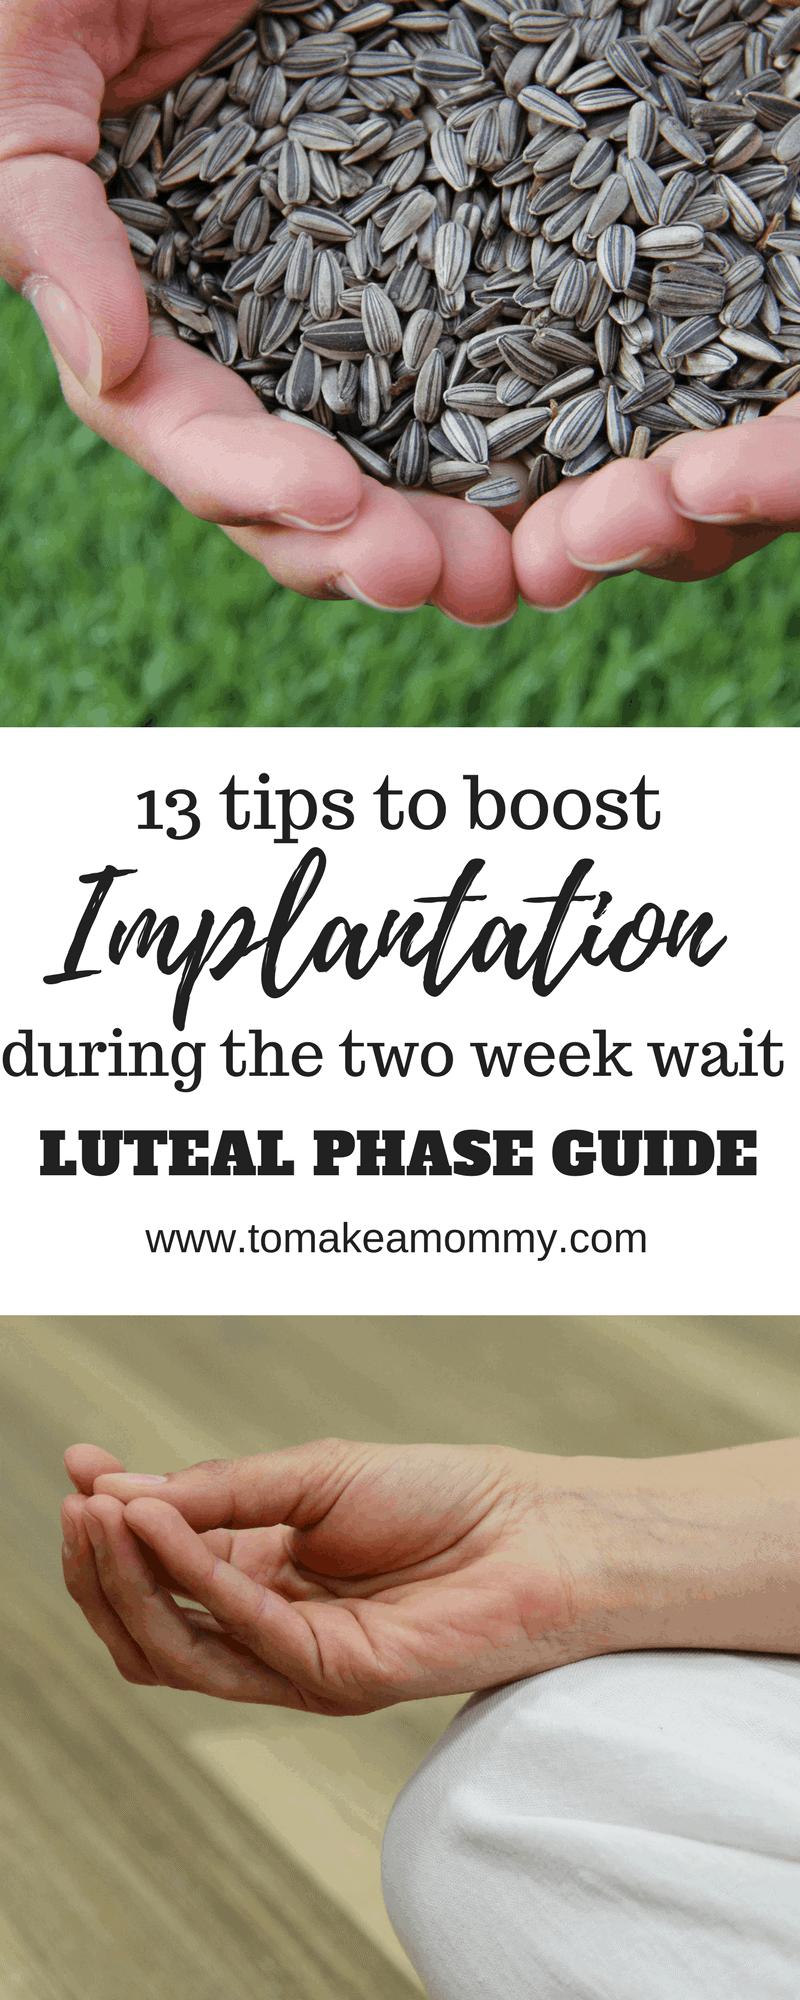 Getting Pregnant Implantation